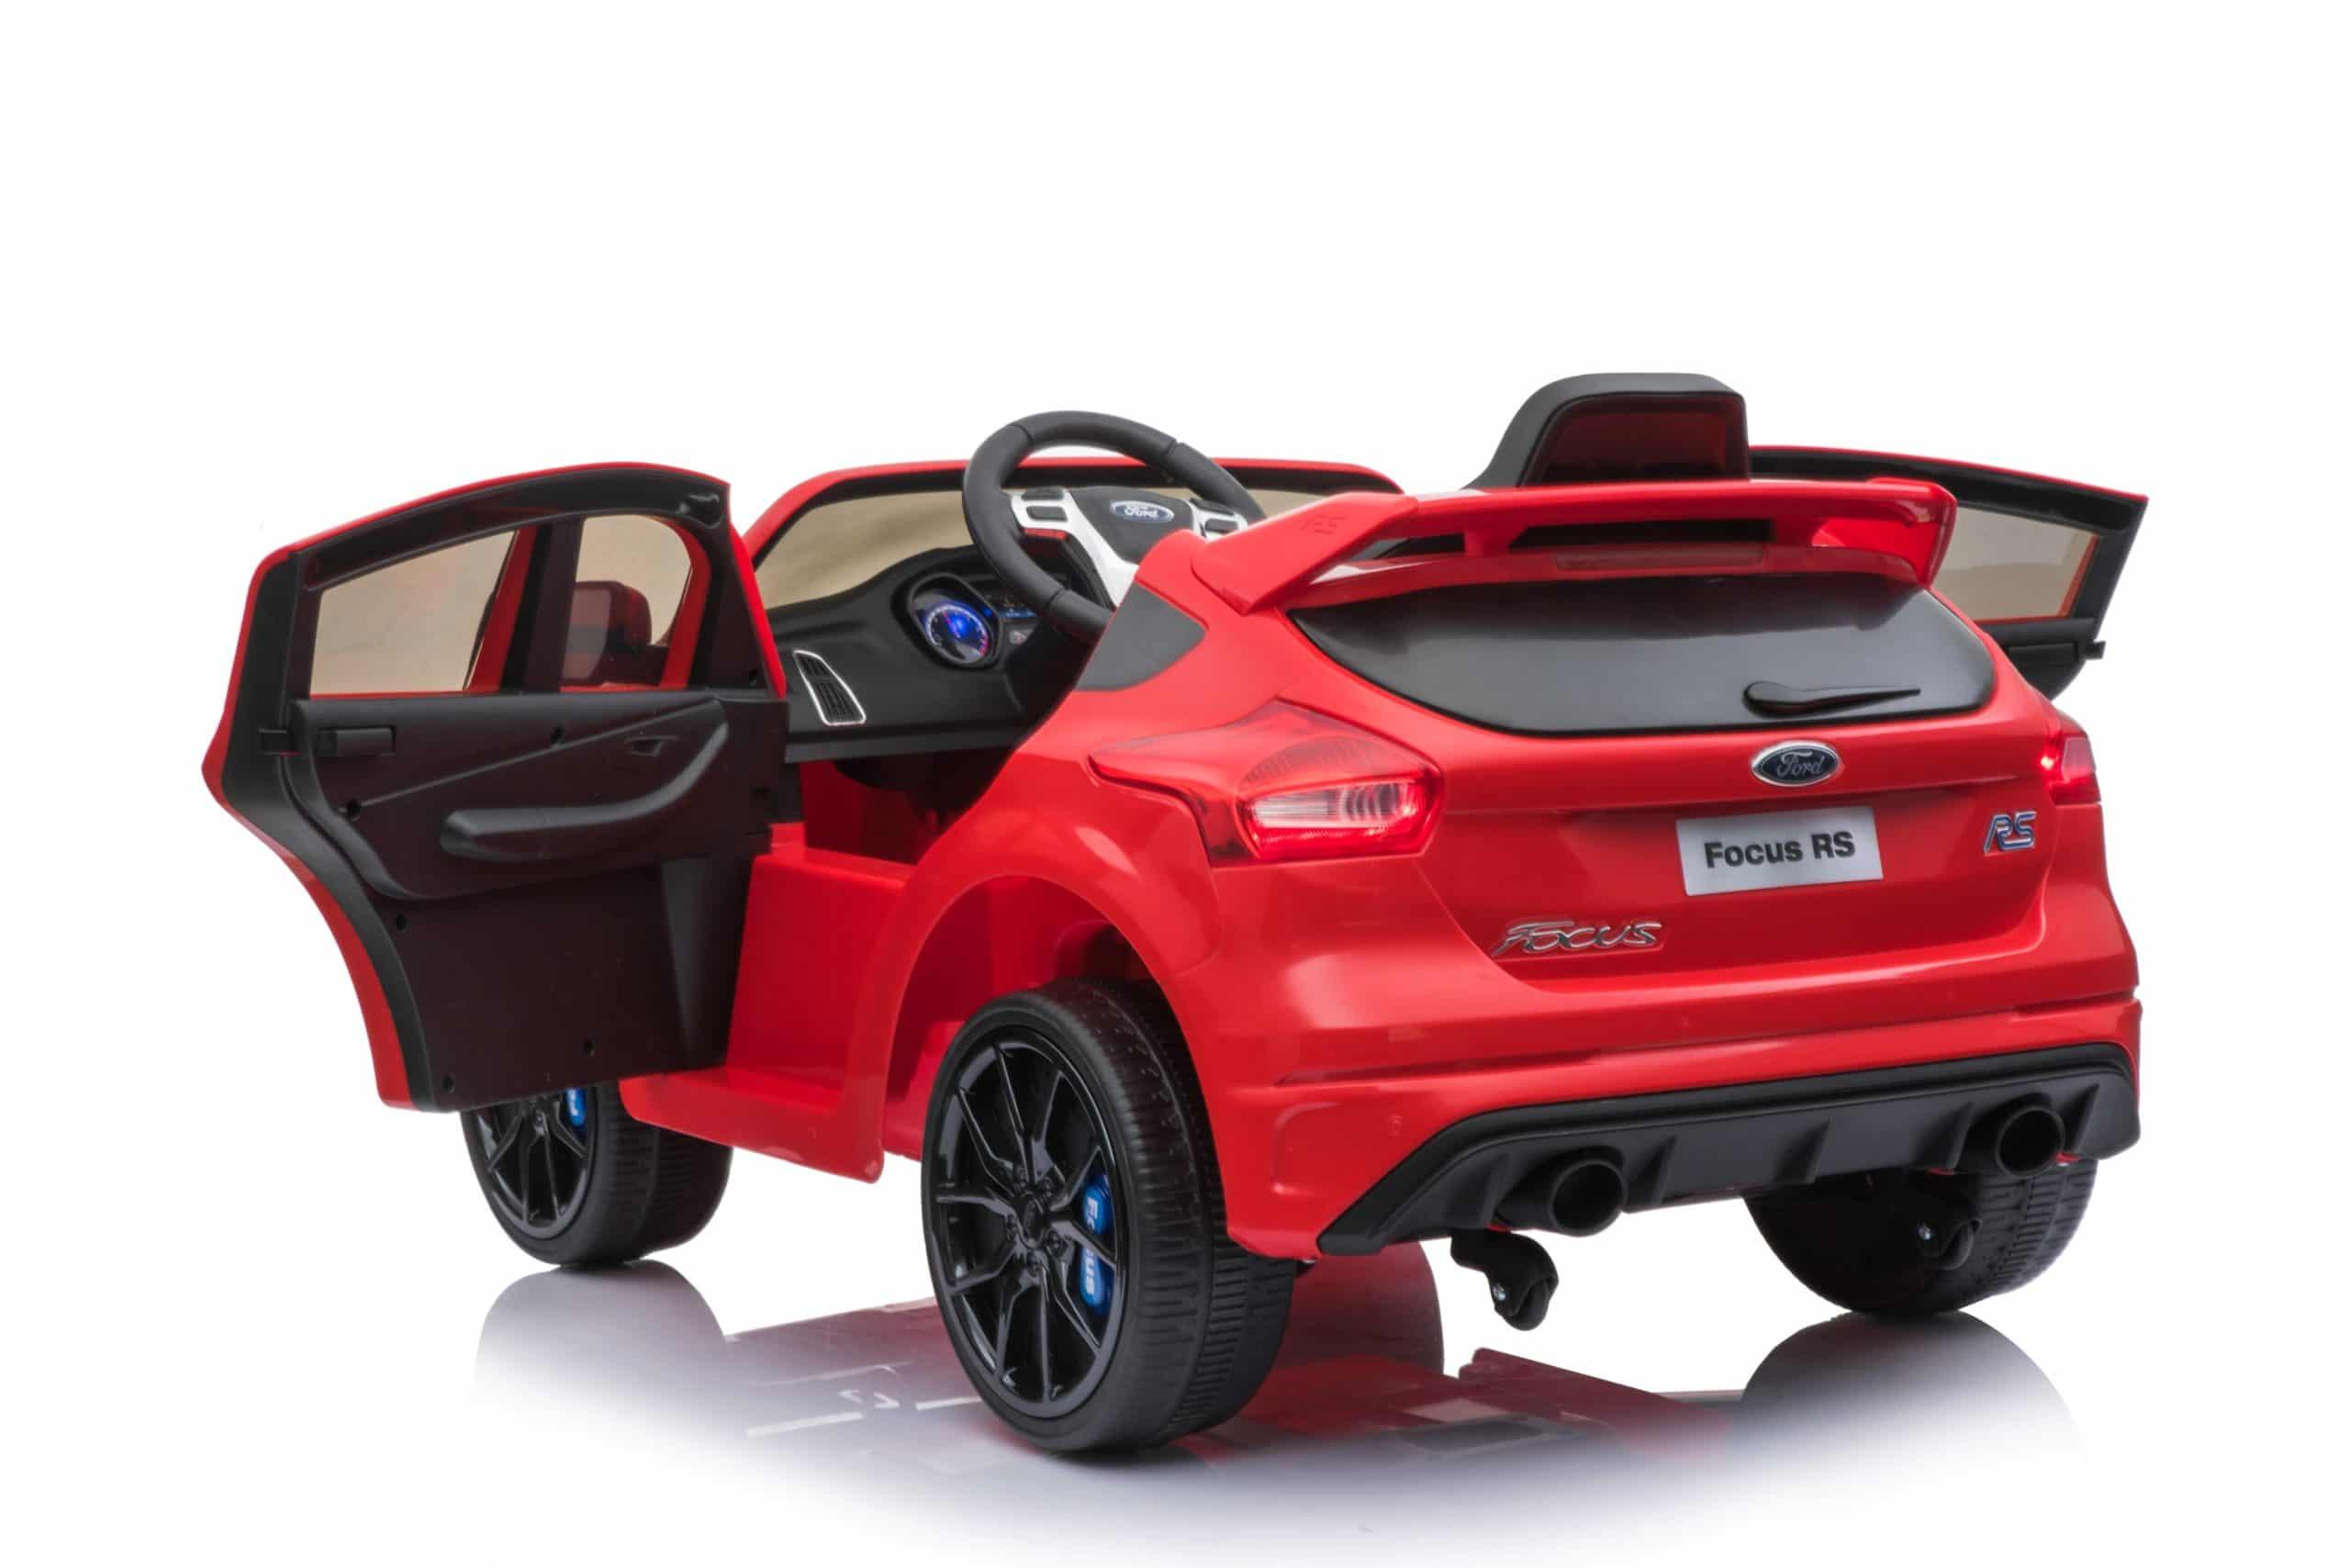 Licensed Ford Focus Rs 12v Childrens Kids Battery Ride On Car – Red